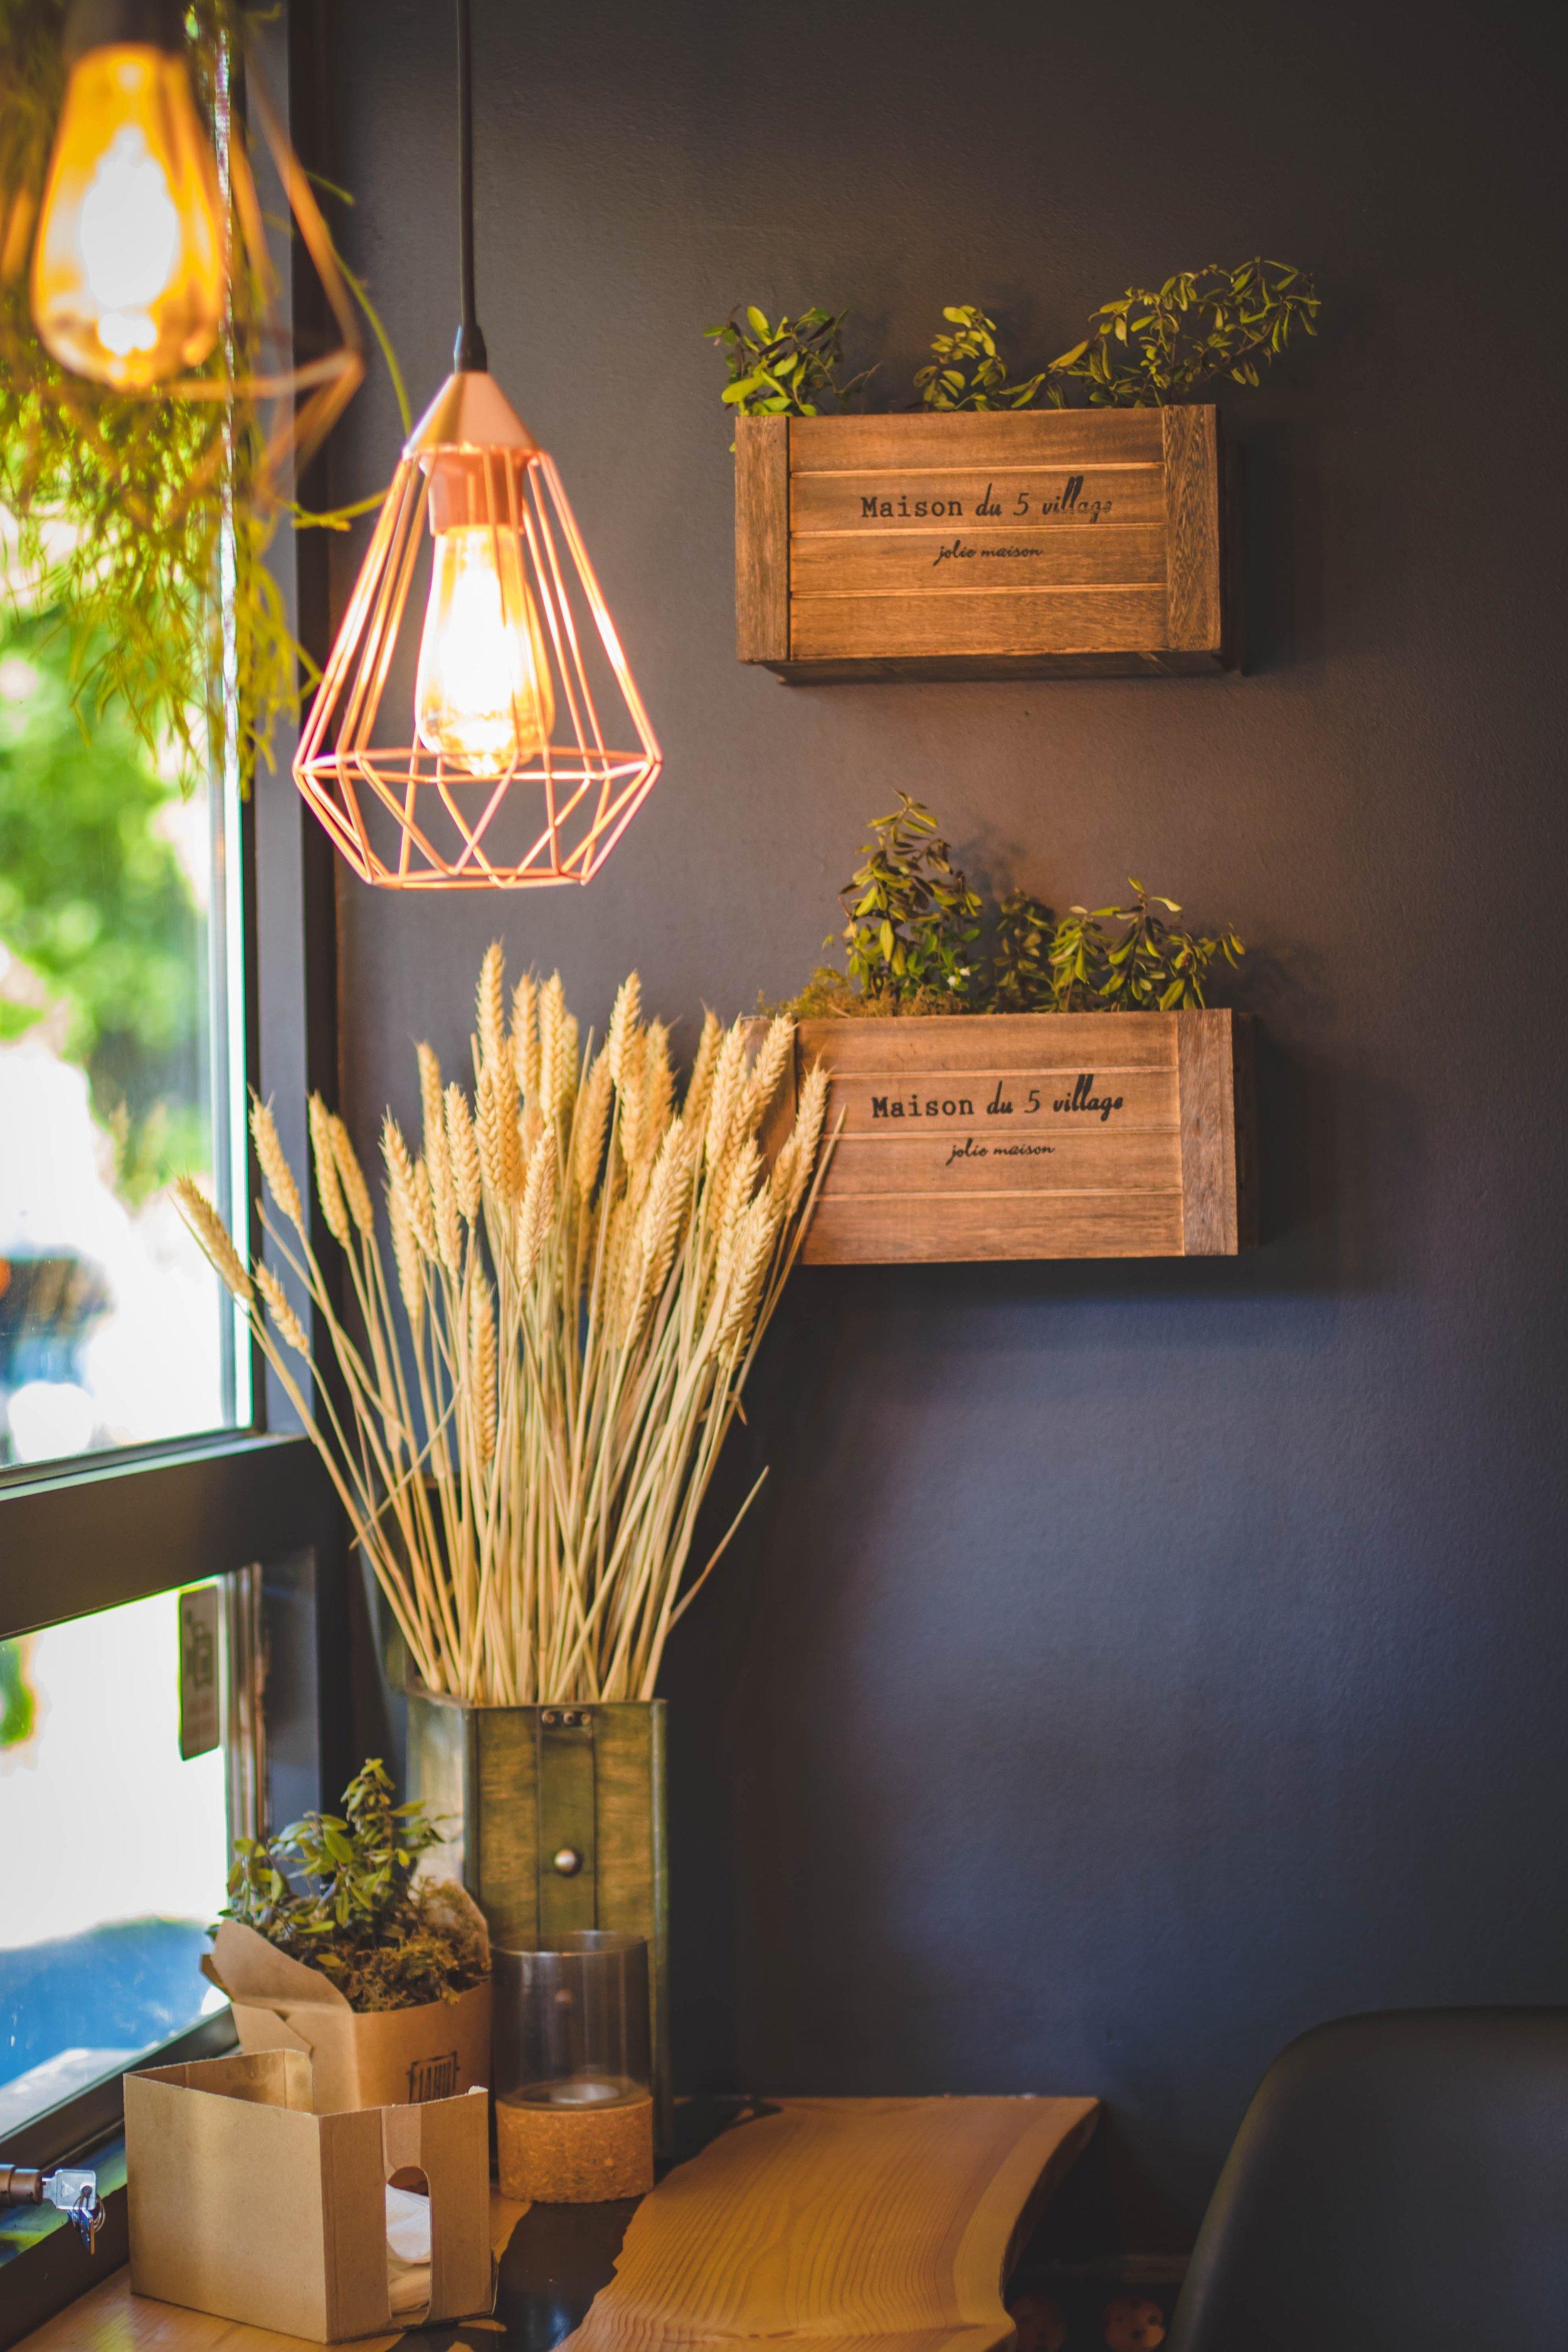 bright-decoration-design-1129413 house home room  kitchen light window.jpg